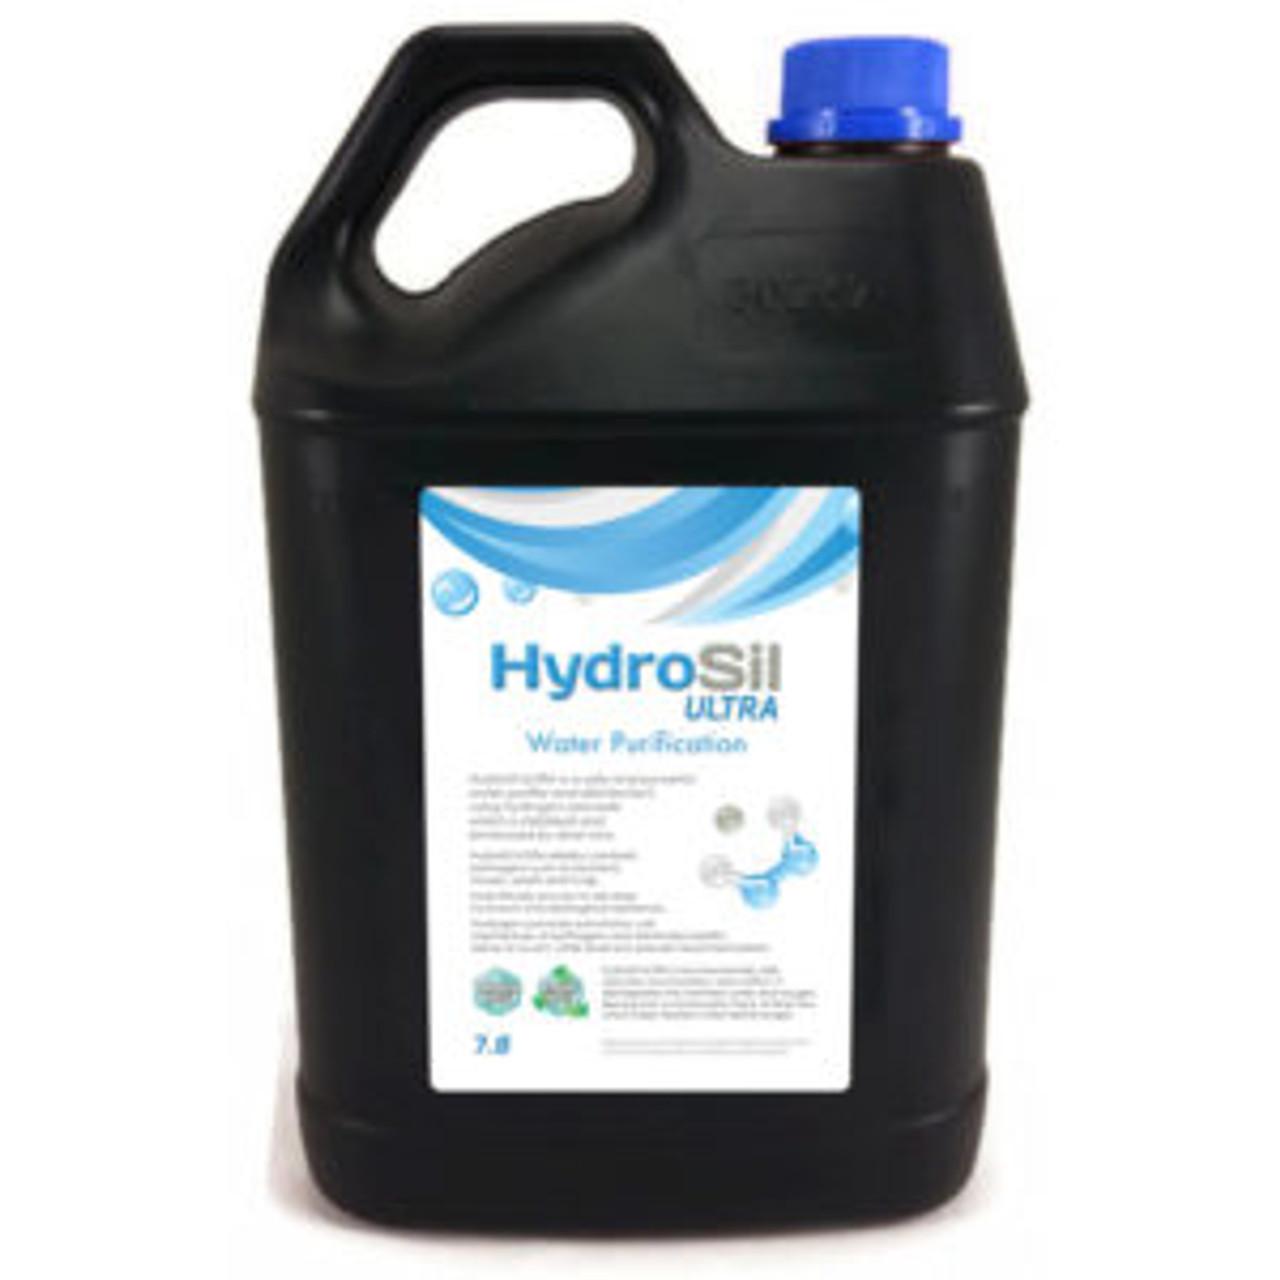 HydroSil 7.8% 5 litre